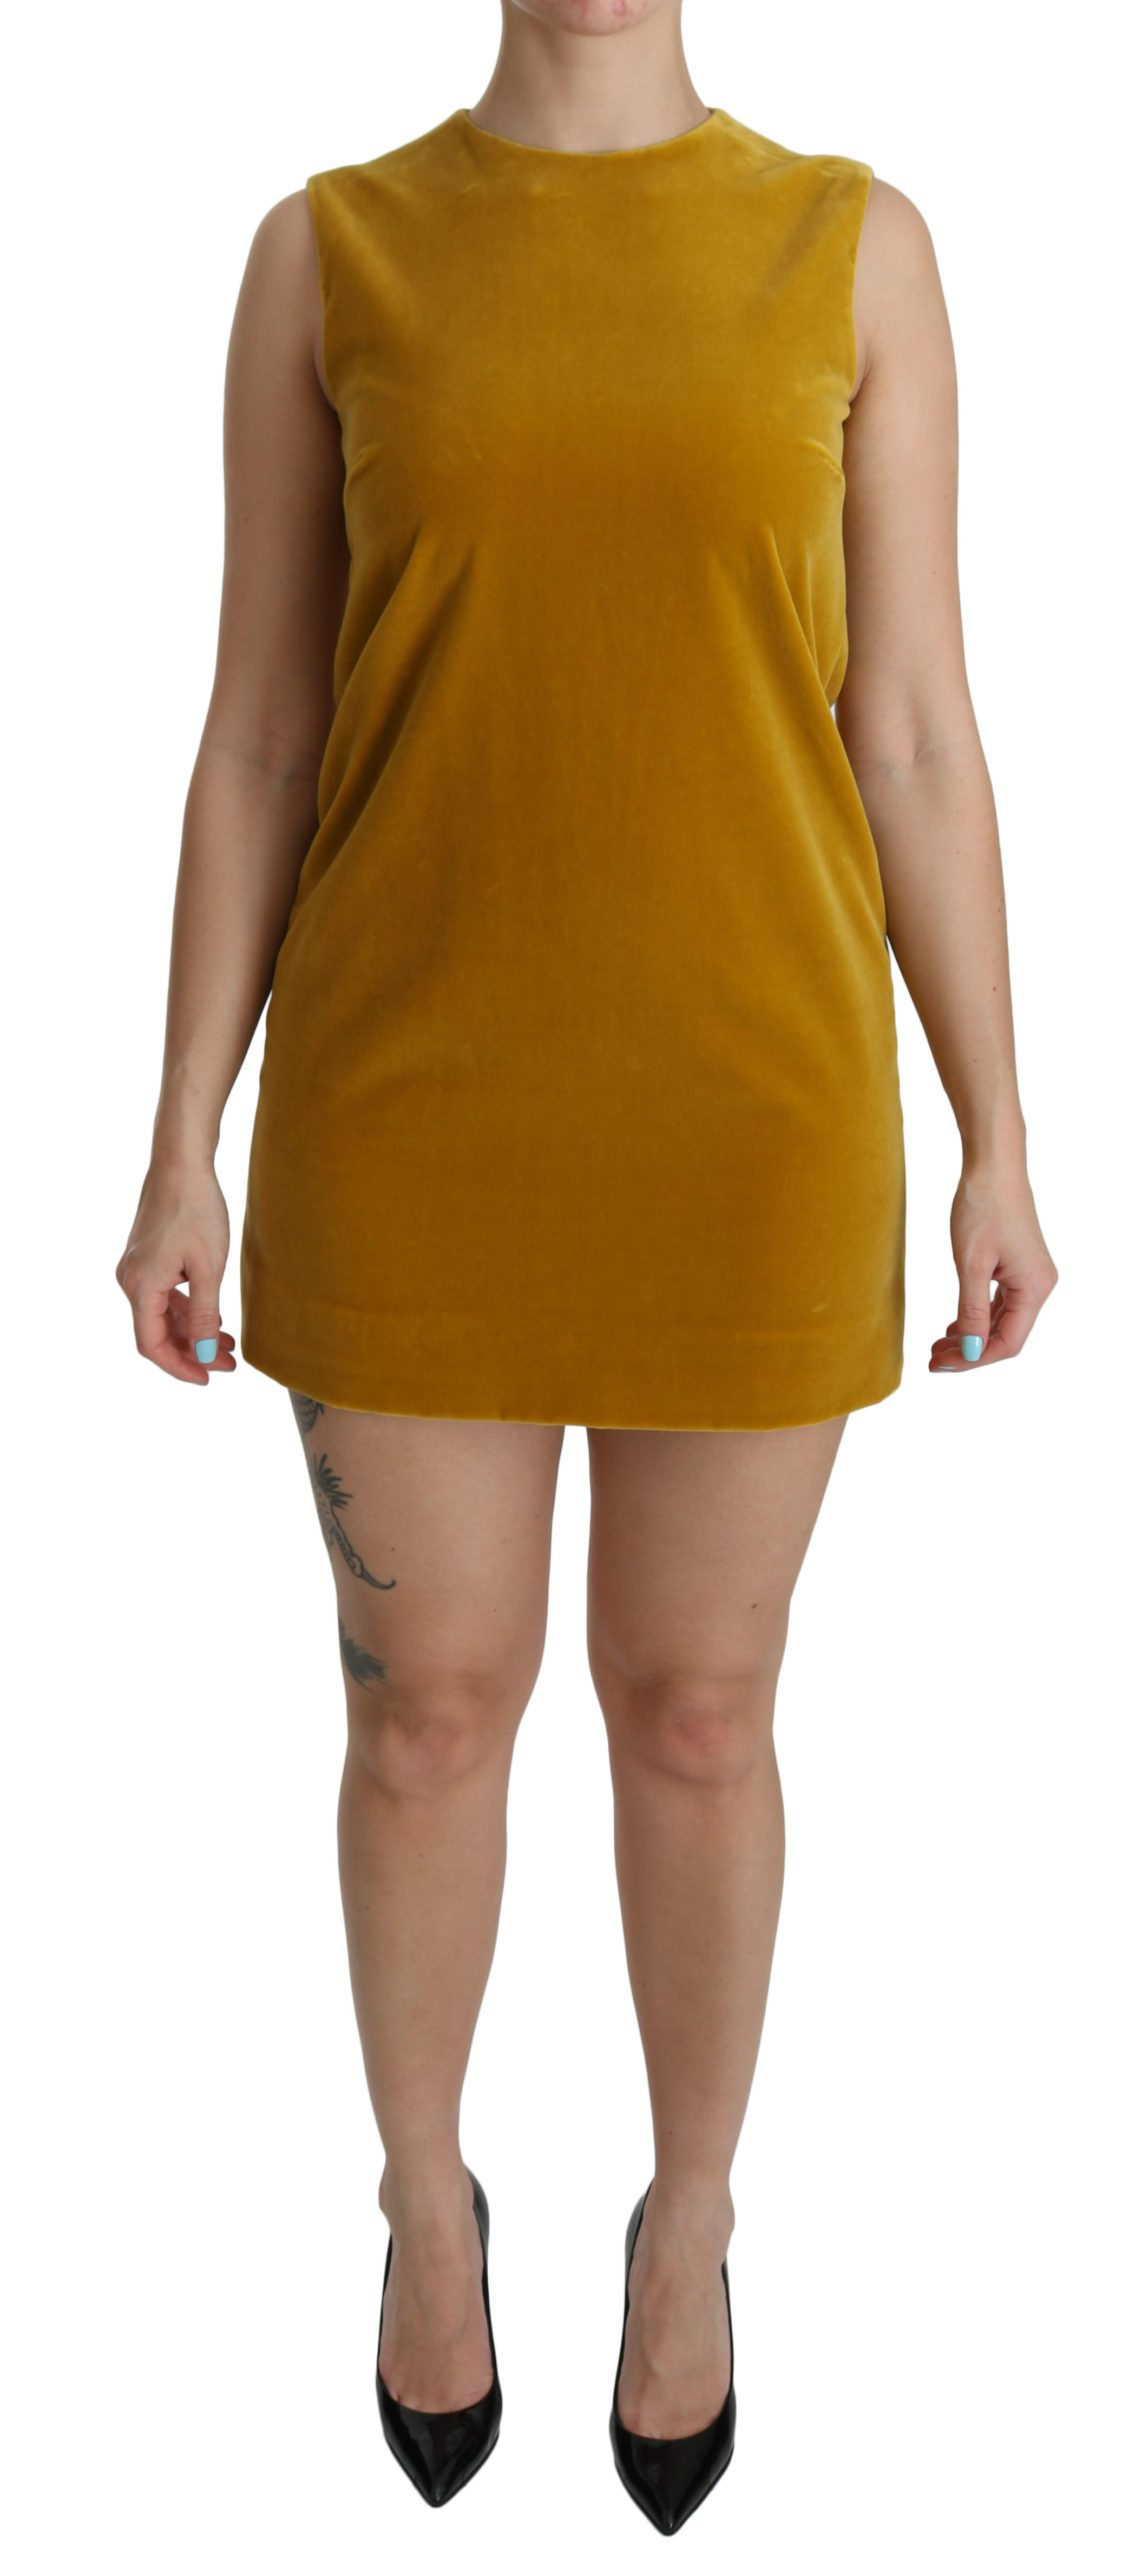 Dolce & Gabbana Women's Stretch Shift Mini Dress Yellow DR2089 - IT40|S